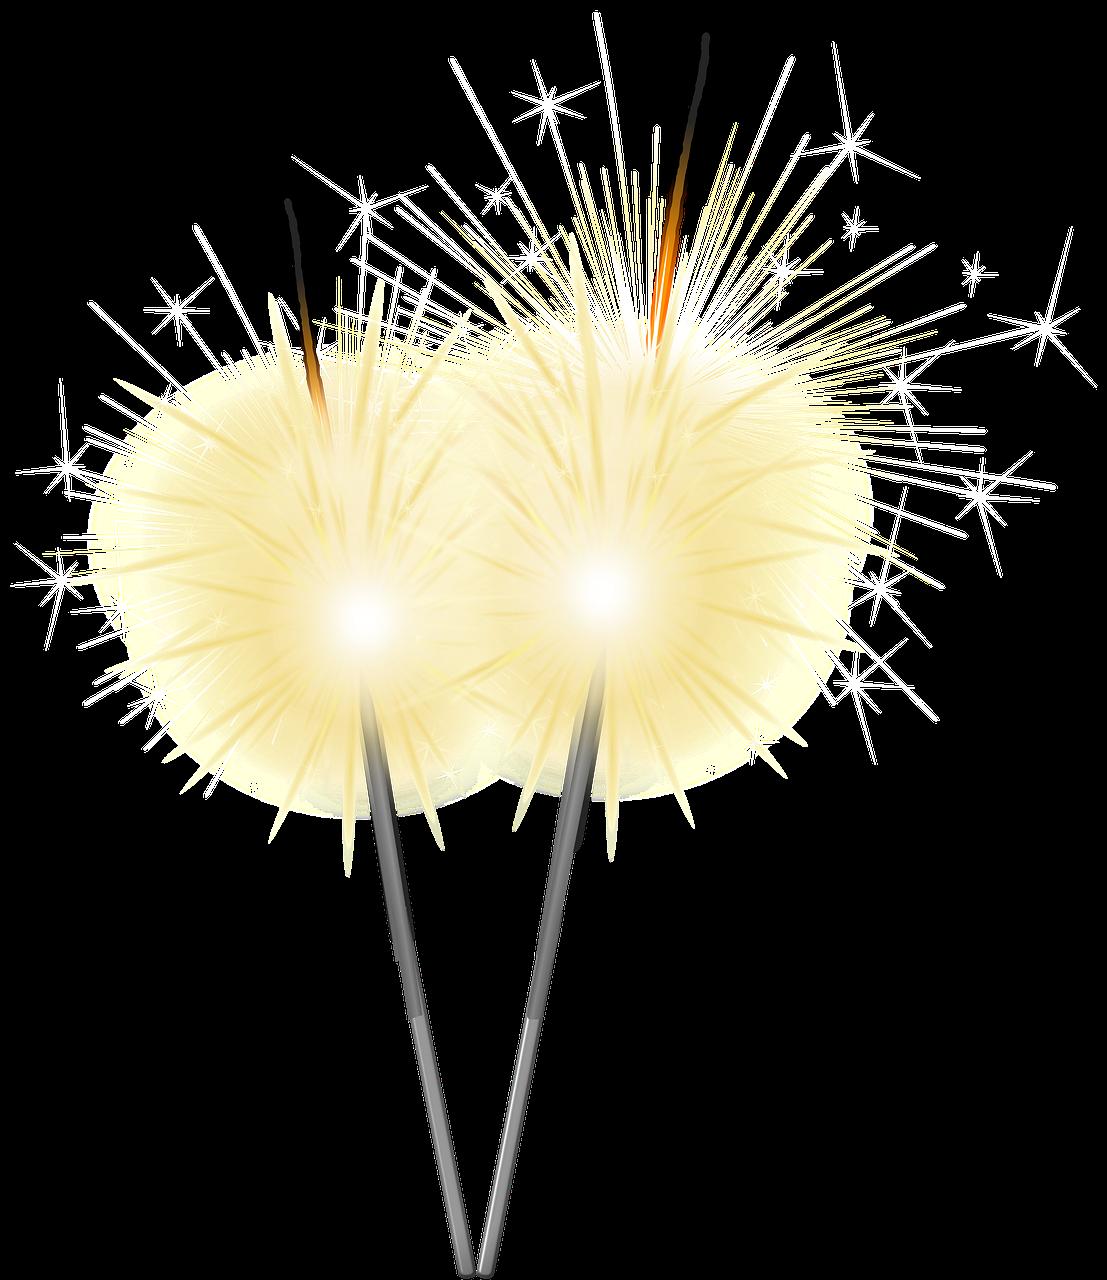 Feuerwerk Vektor Clipart Bild -vc017474-CoolCLIPS.com